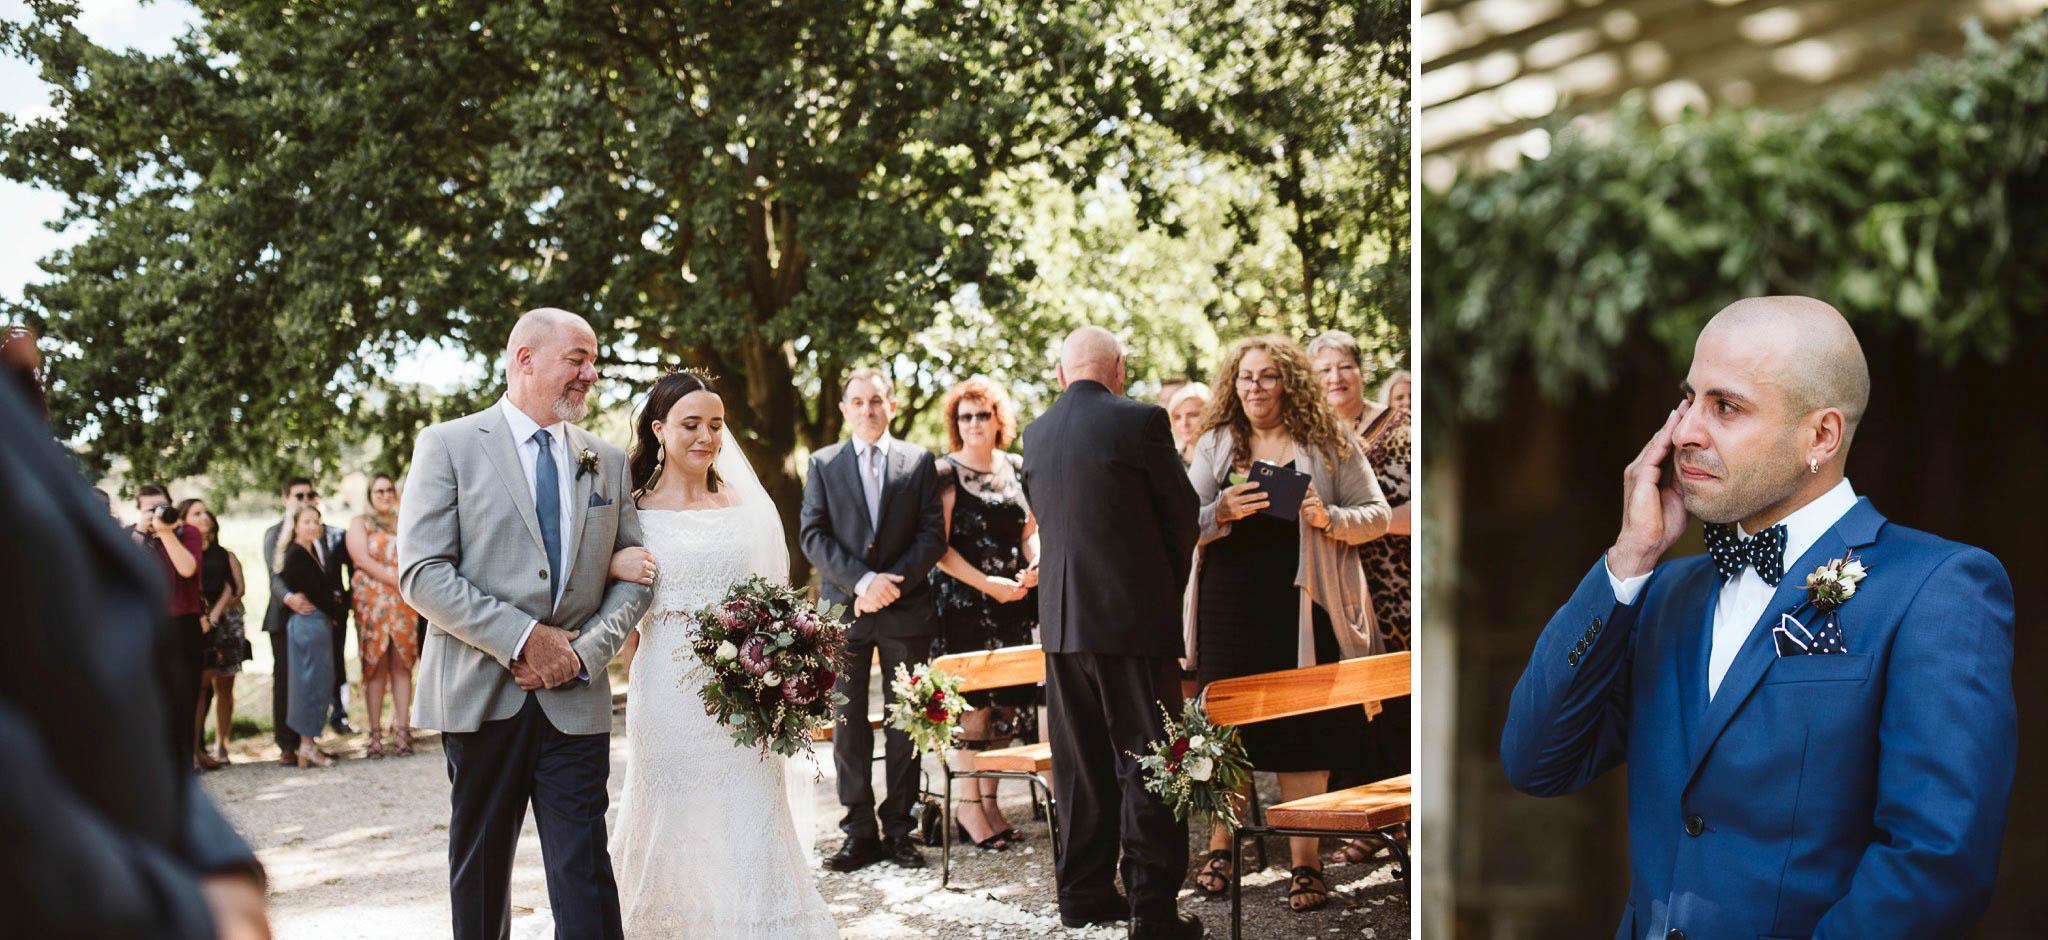 The Farm Yarra Valley Wedding Photography Ashleigh Haase-44.jpg